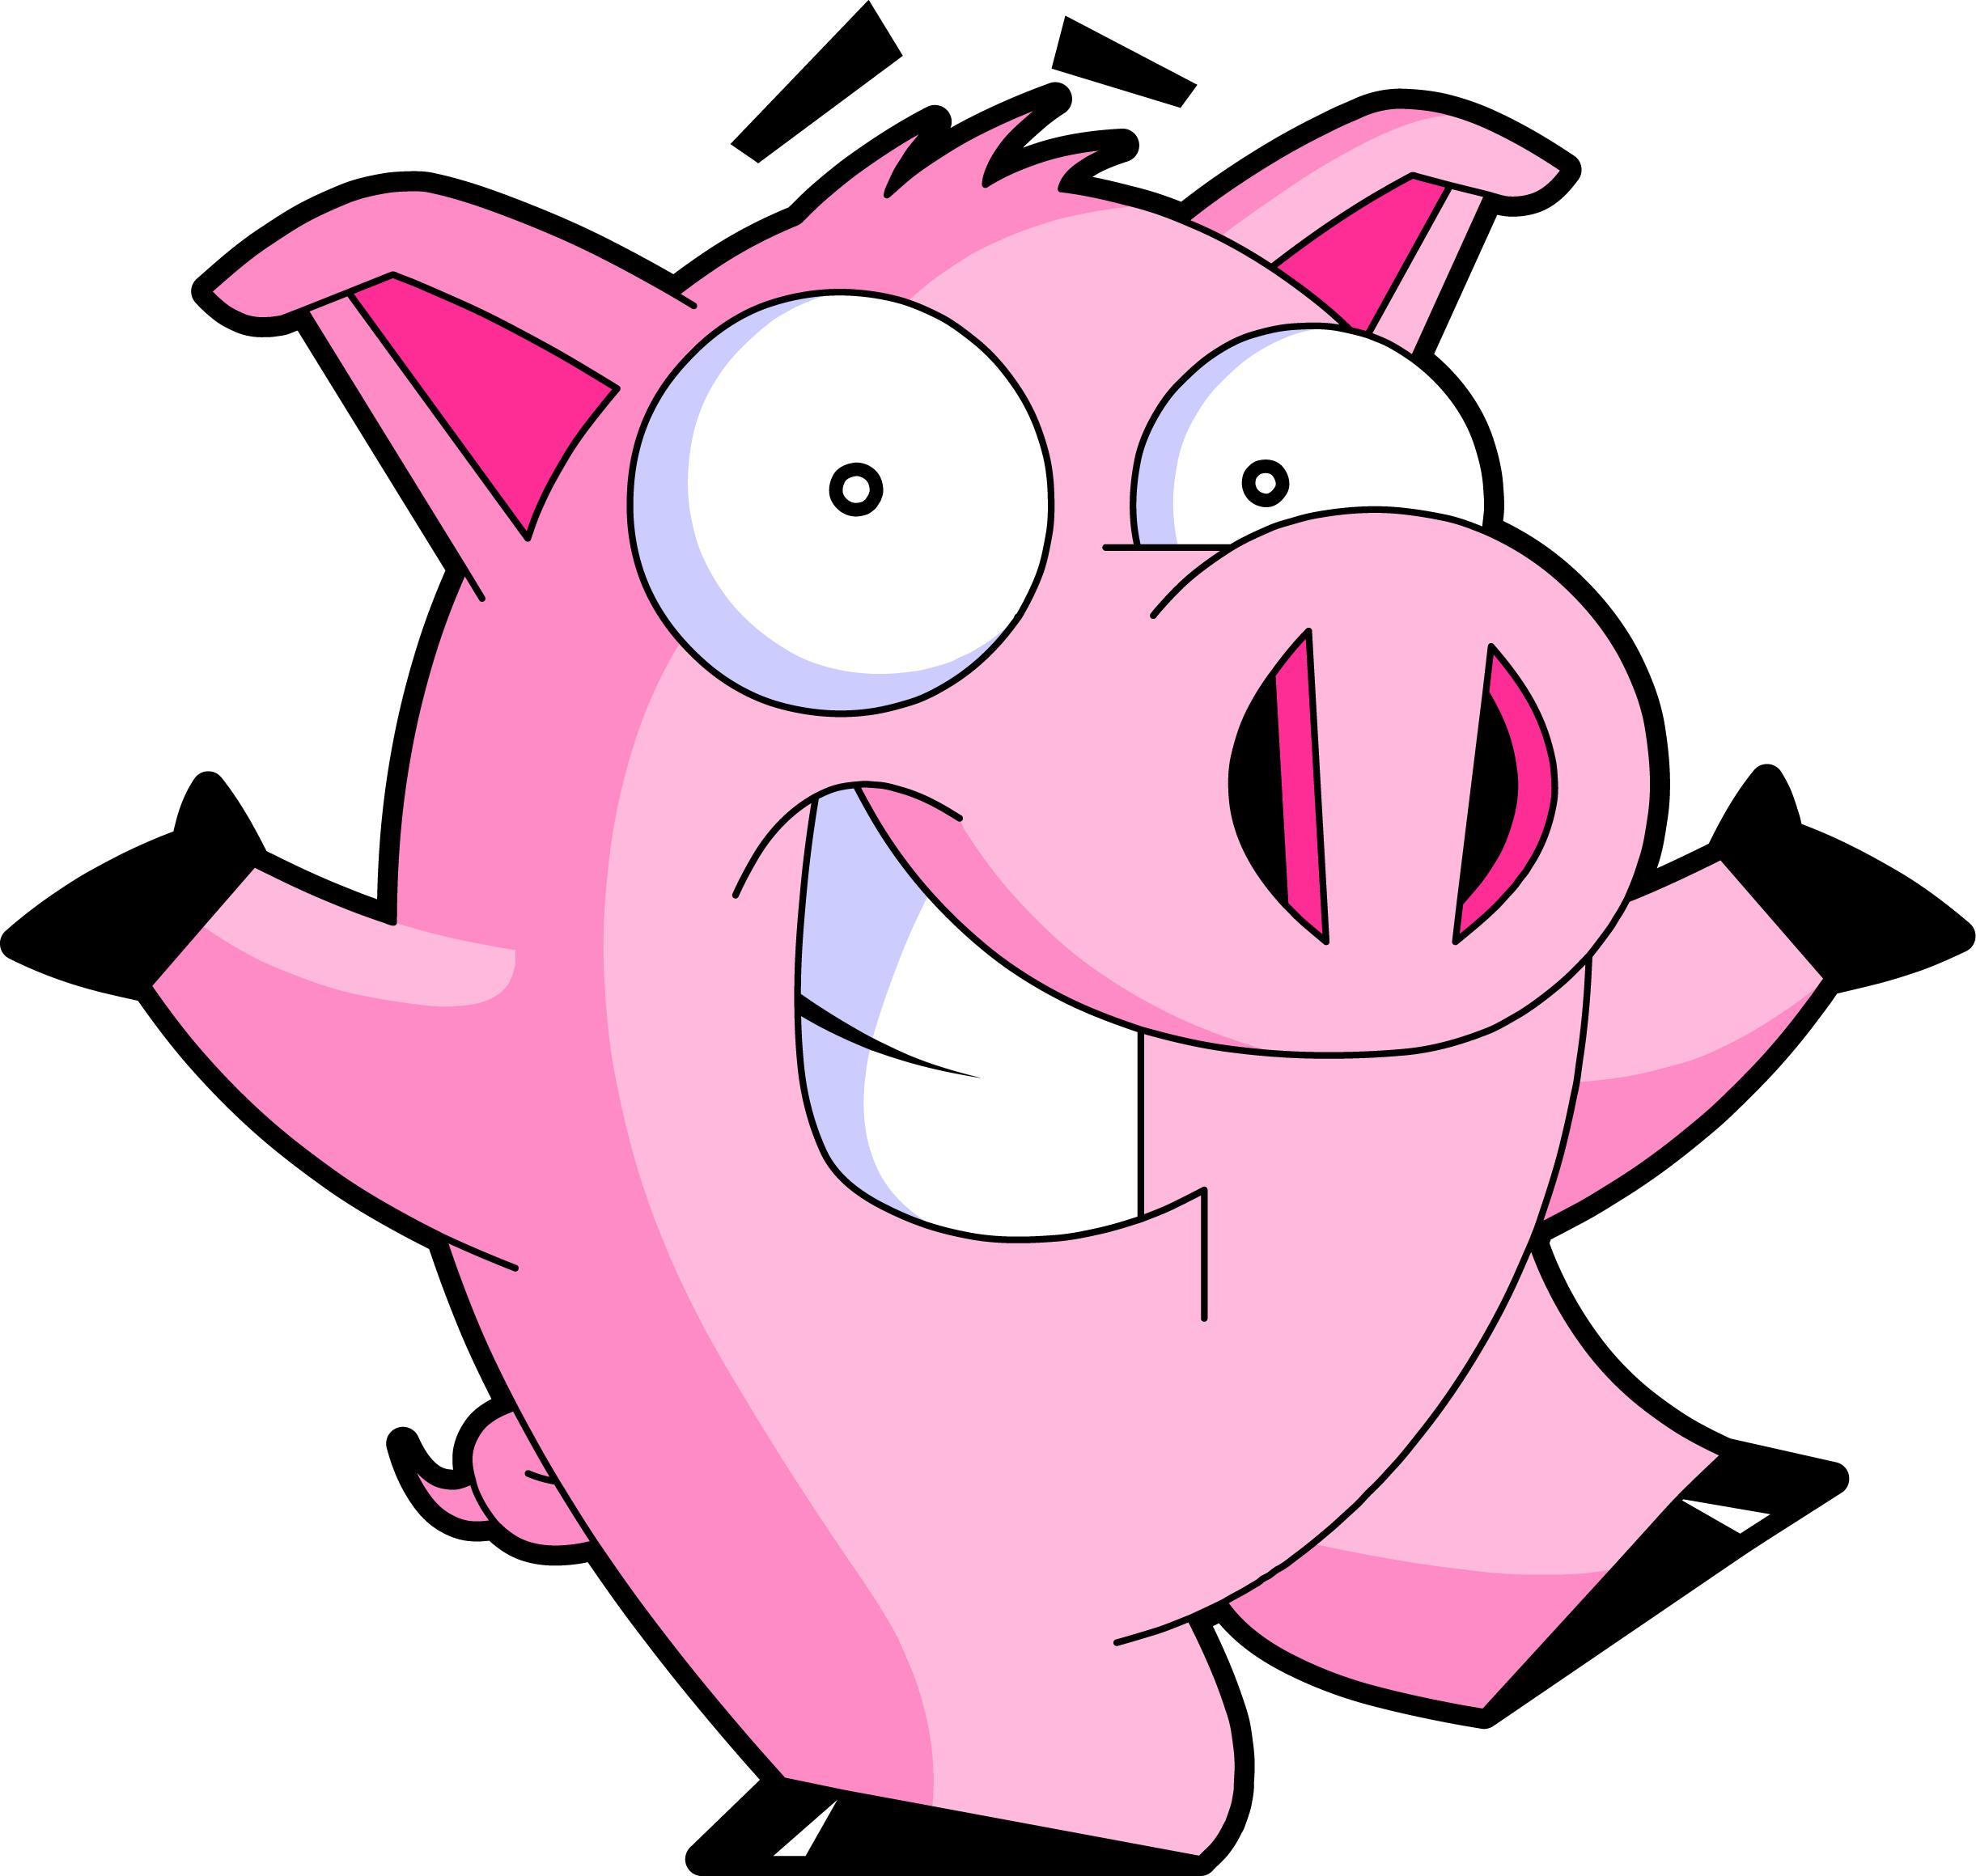 bbq pig clip art free - photo #49